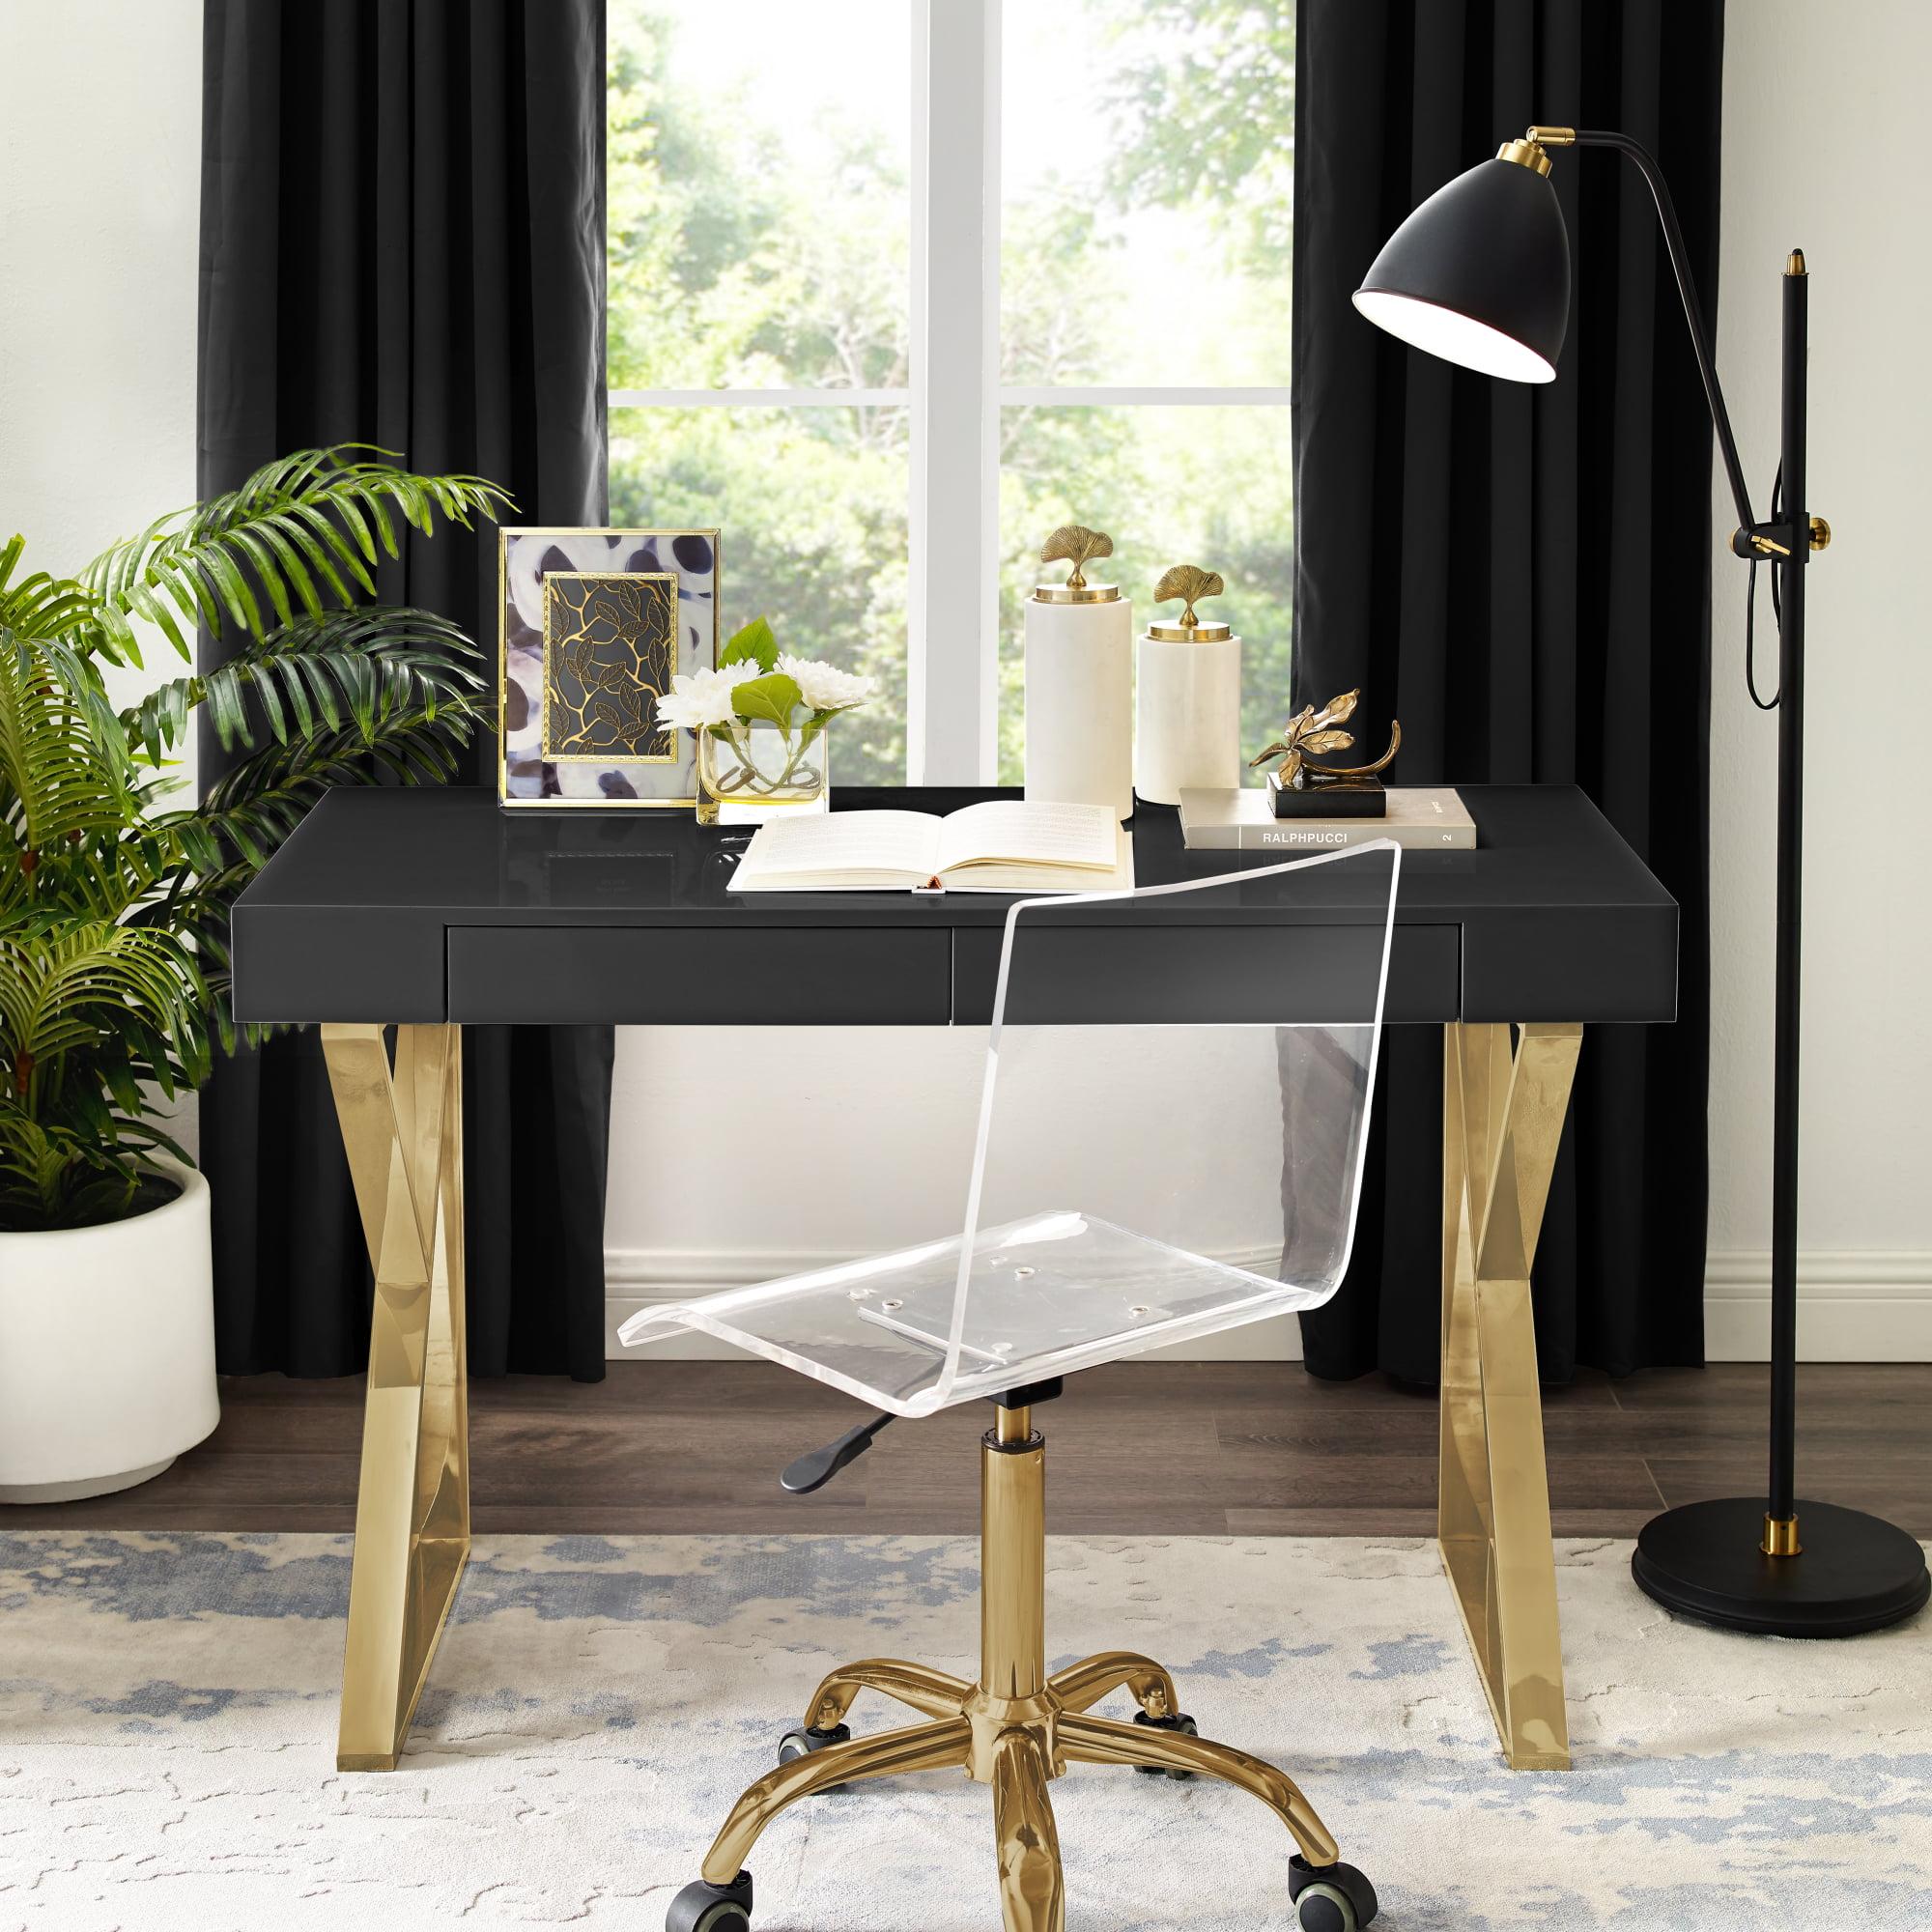 Image of: Inspired Home Baduchi Desk 2 Drawers High Gloss Stainless Steel Base Modern Design Black Gold Walmart Com Walmart Com